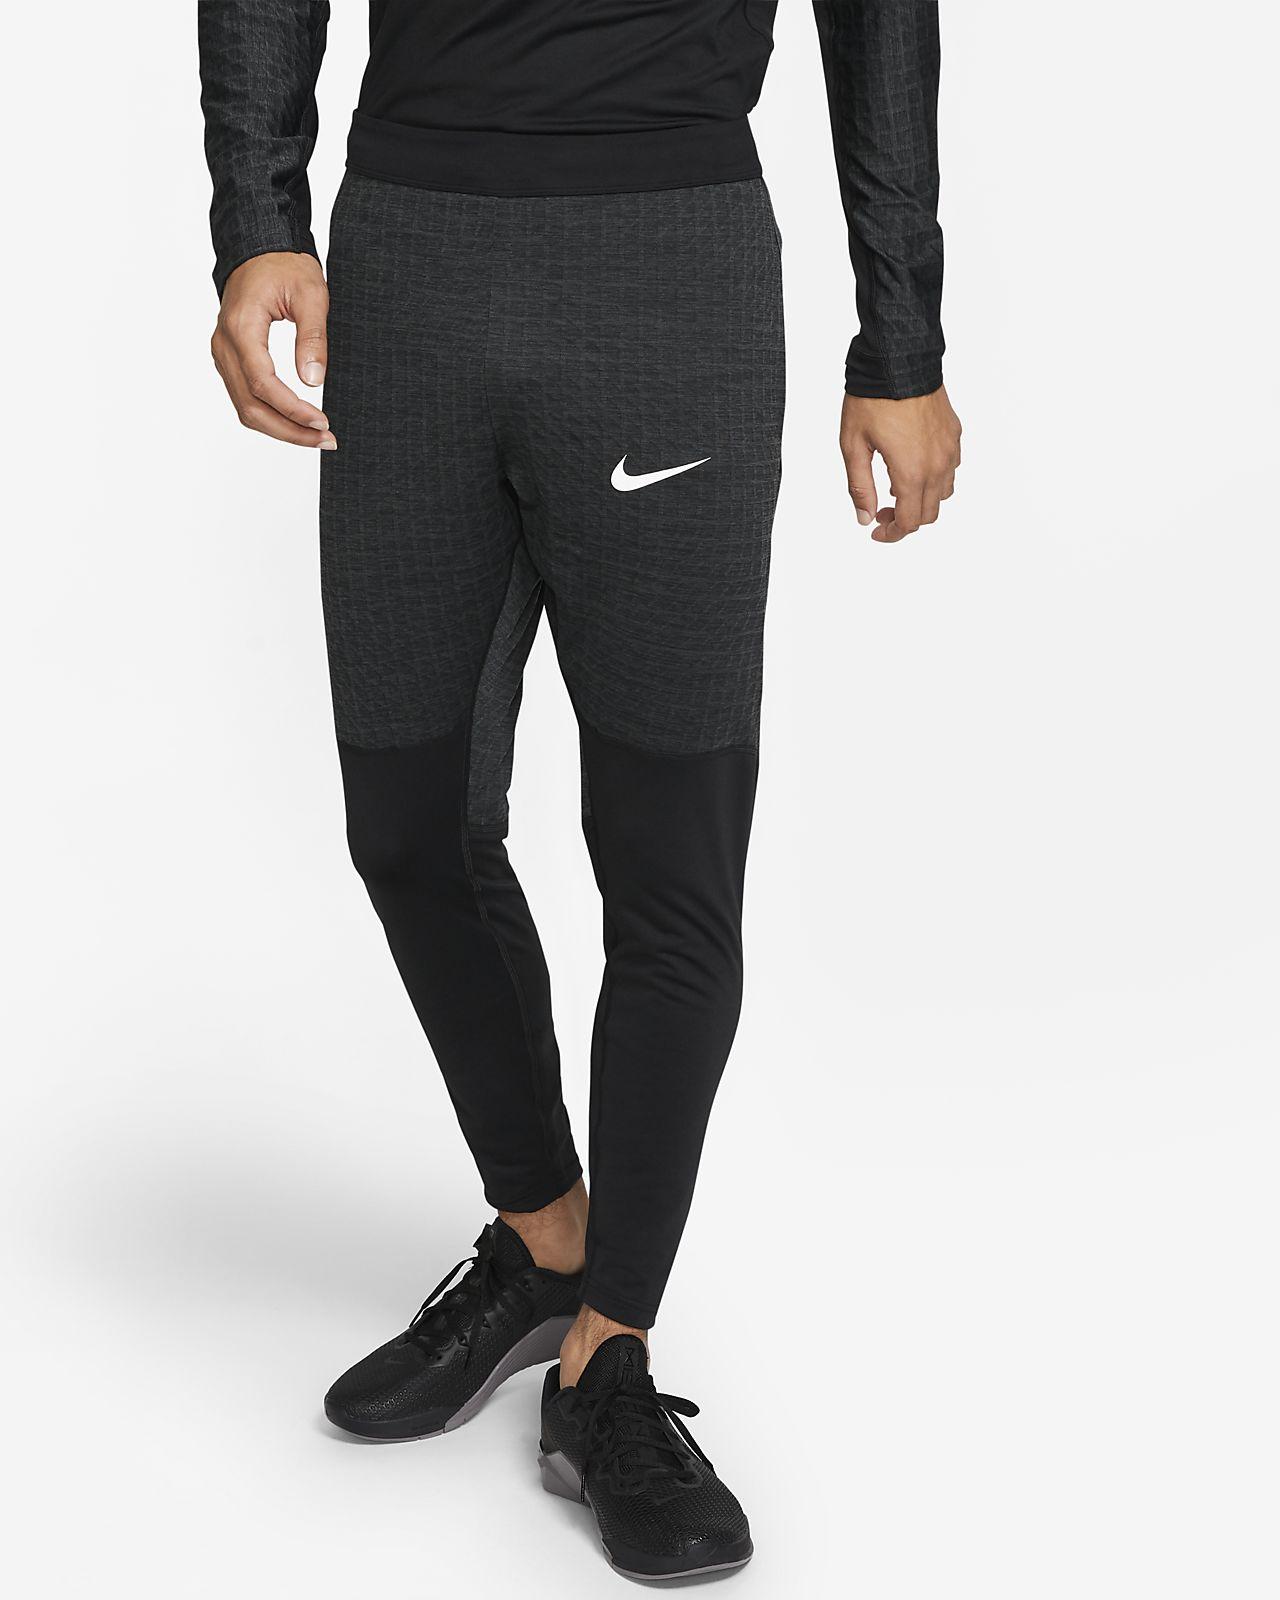 Nike Pro Men's Training Tights